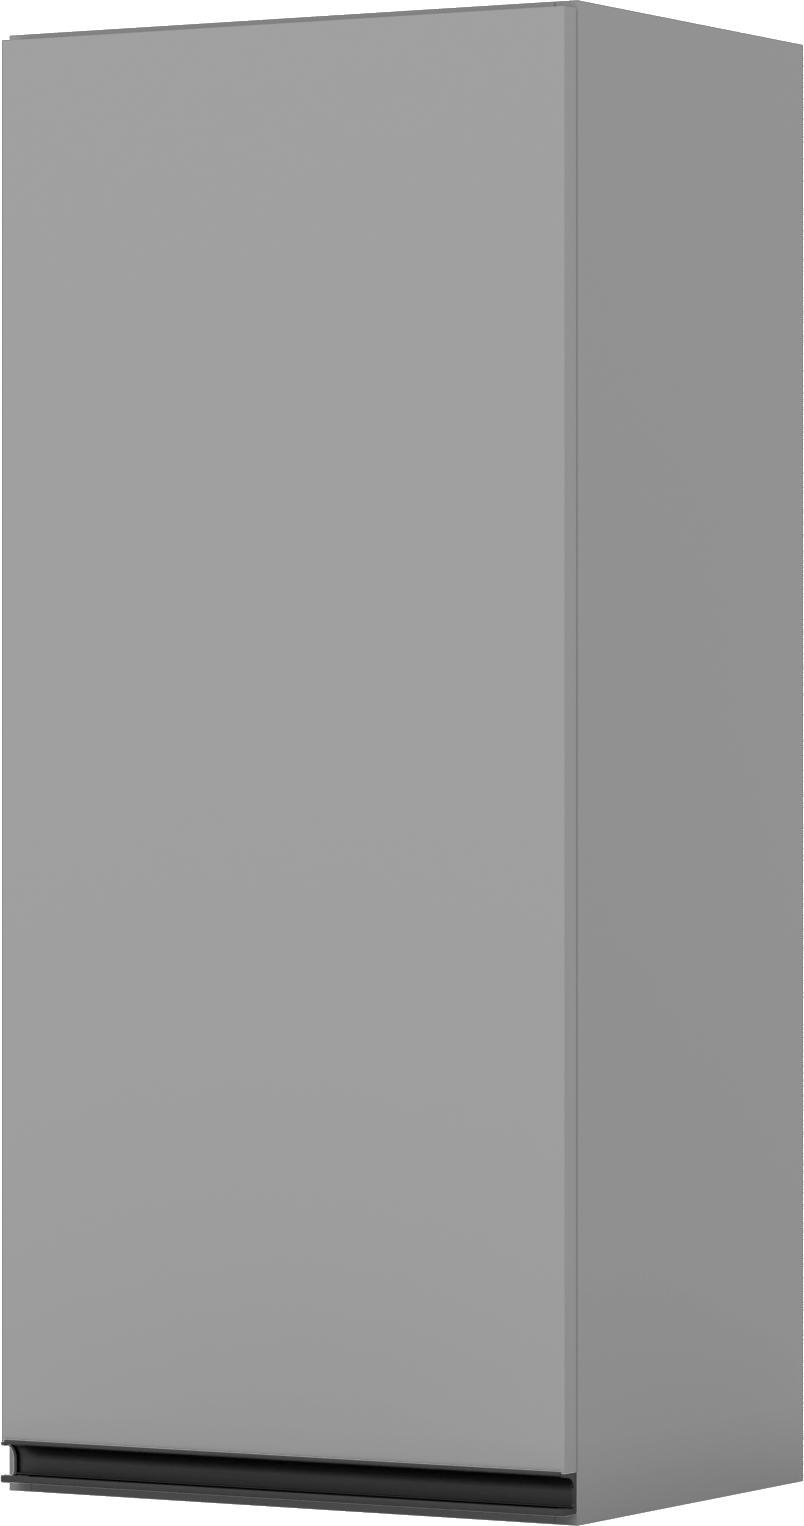 Aéreo 01 Porta 400mm Belize Cinza - Henn